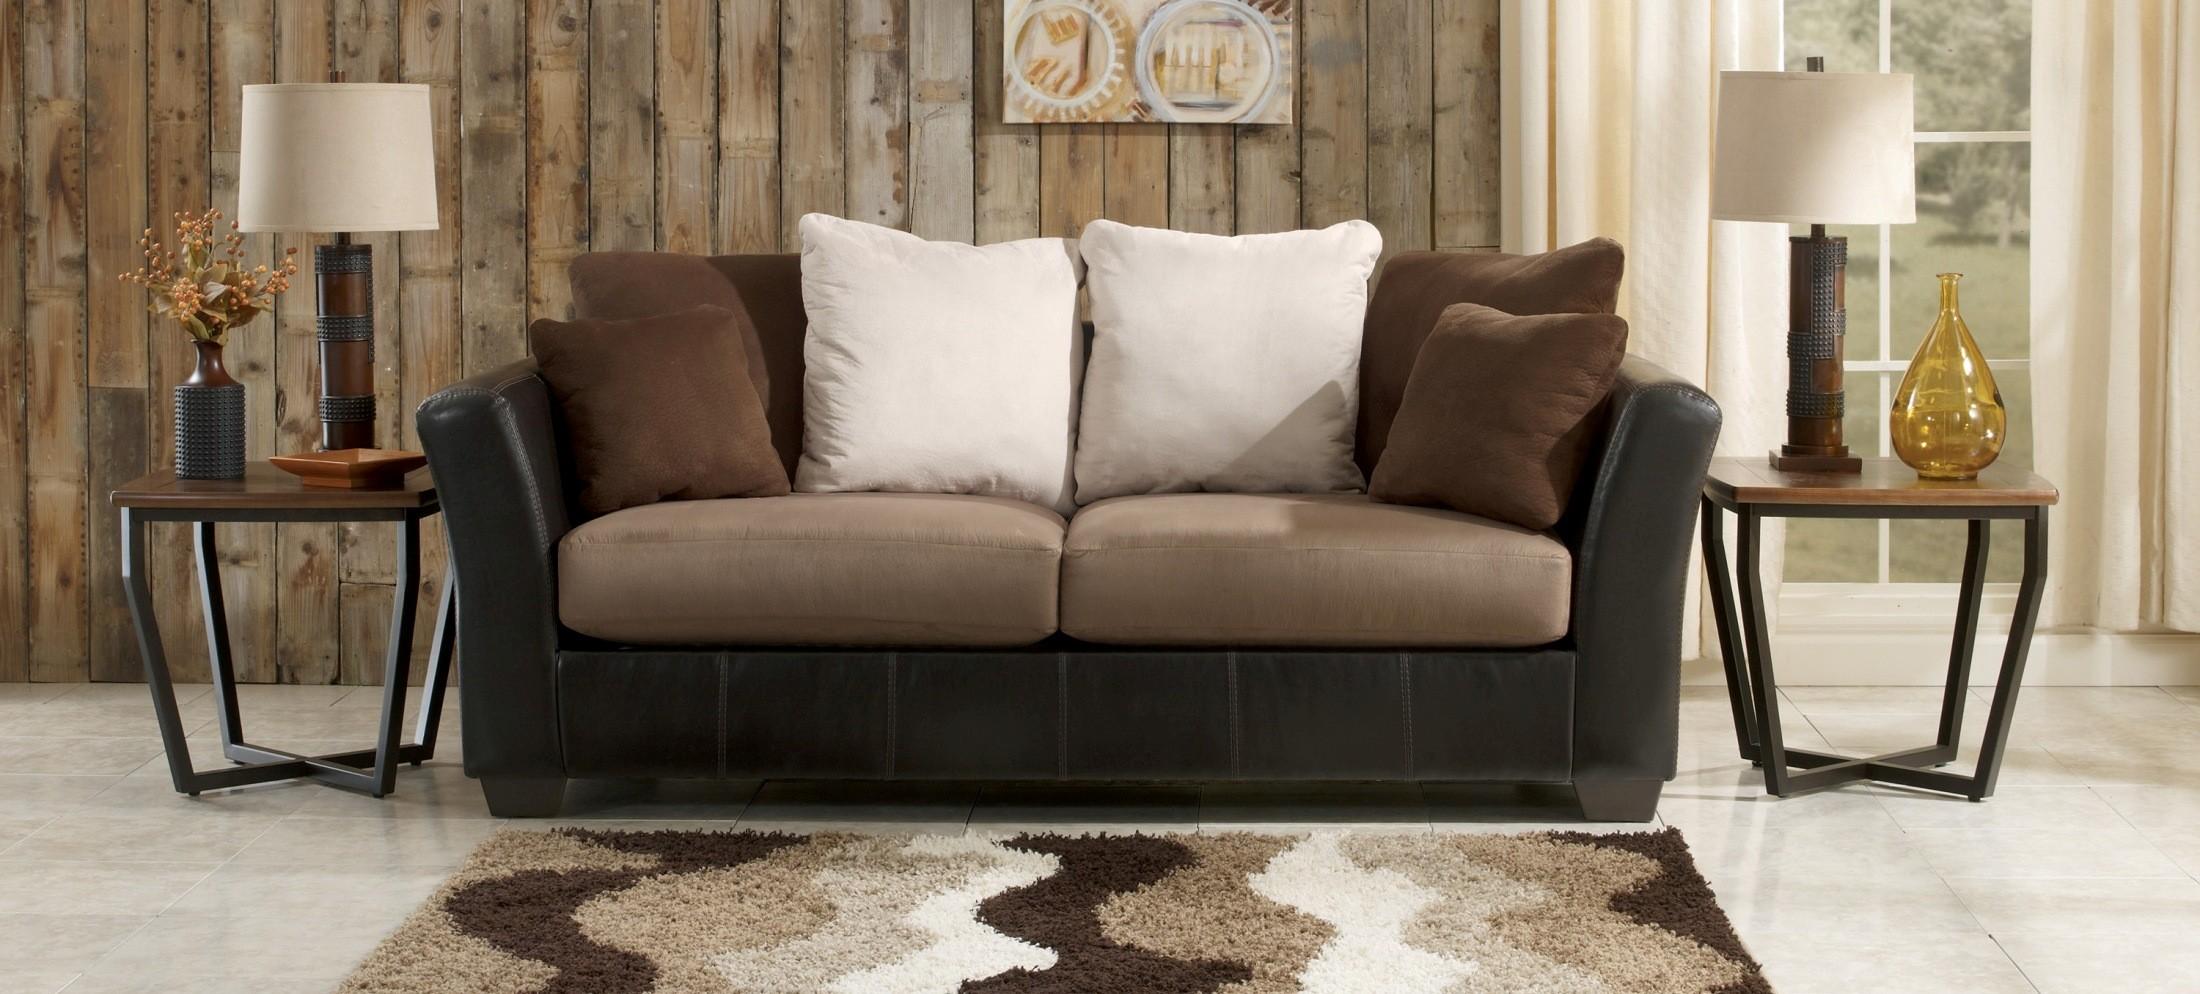 ashley furniture morandi mocha sofa retro sofas masoli 1420138